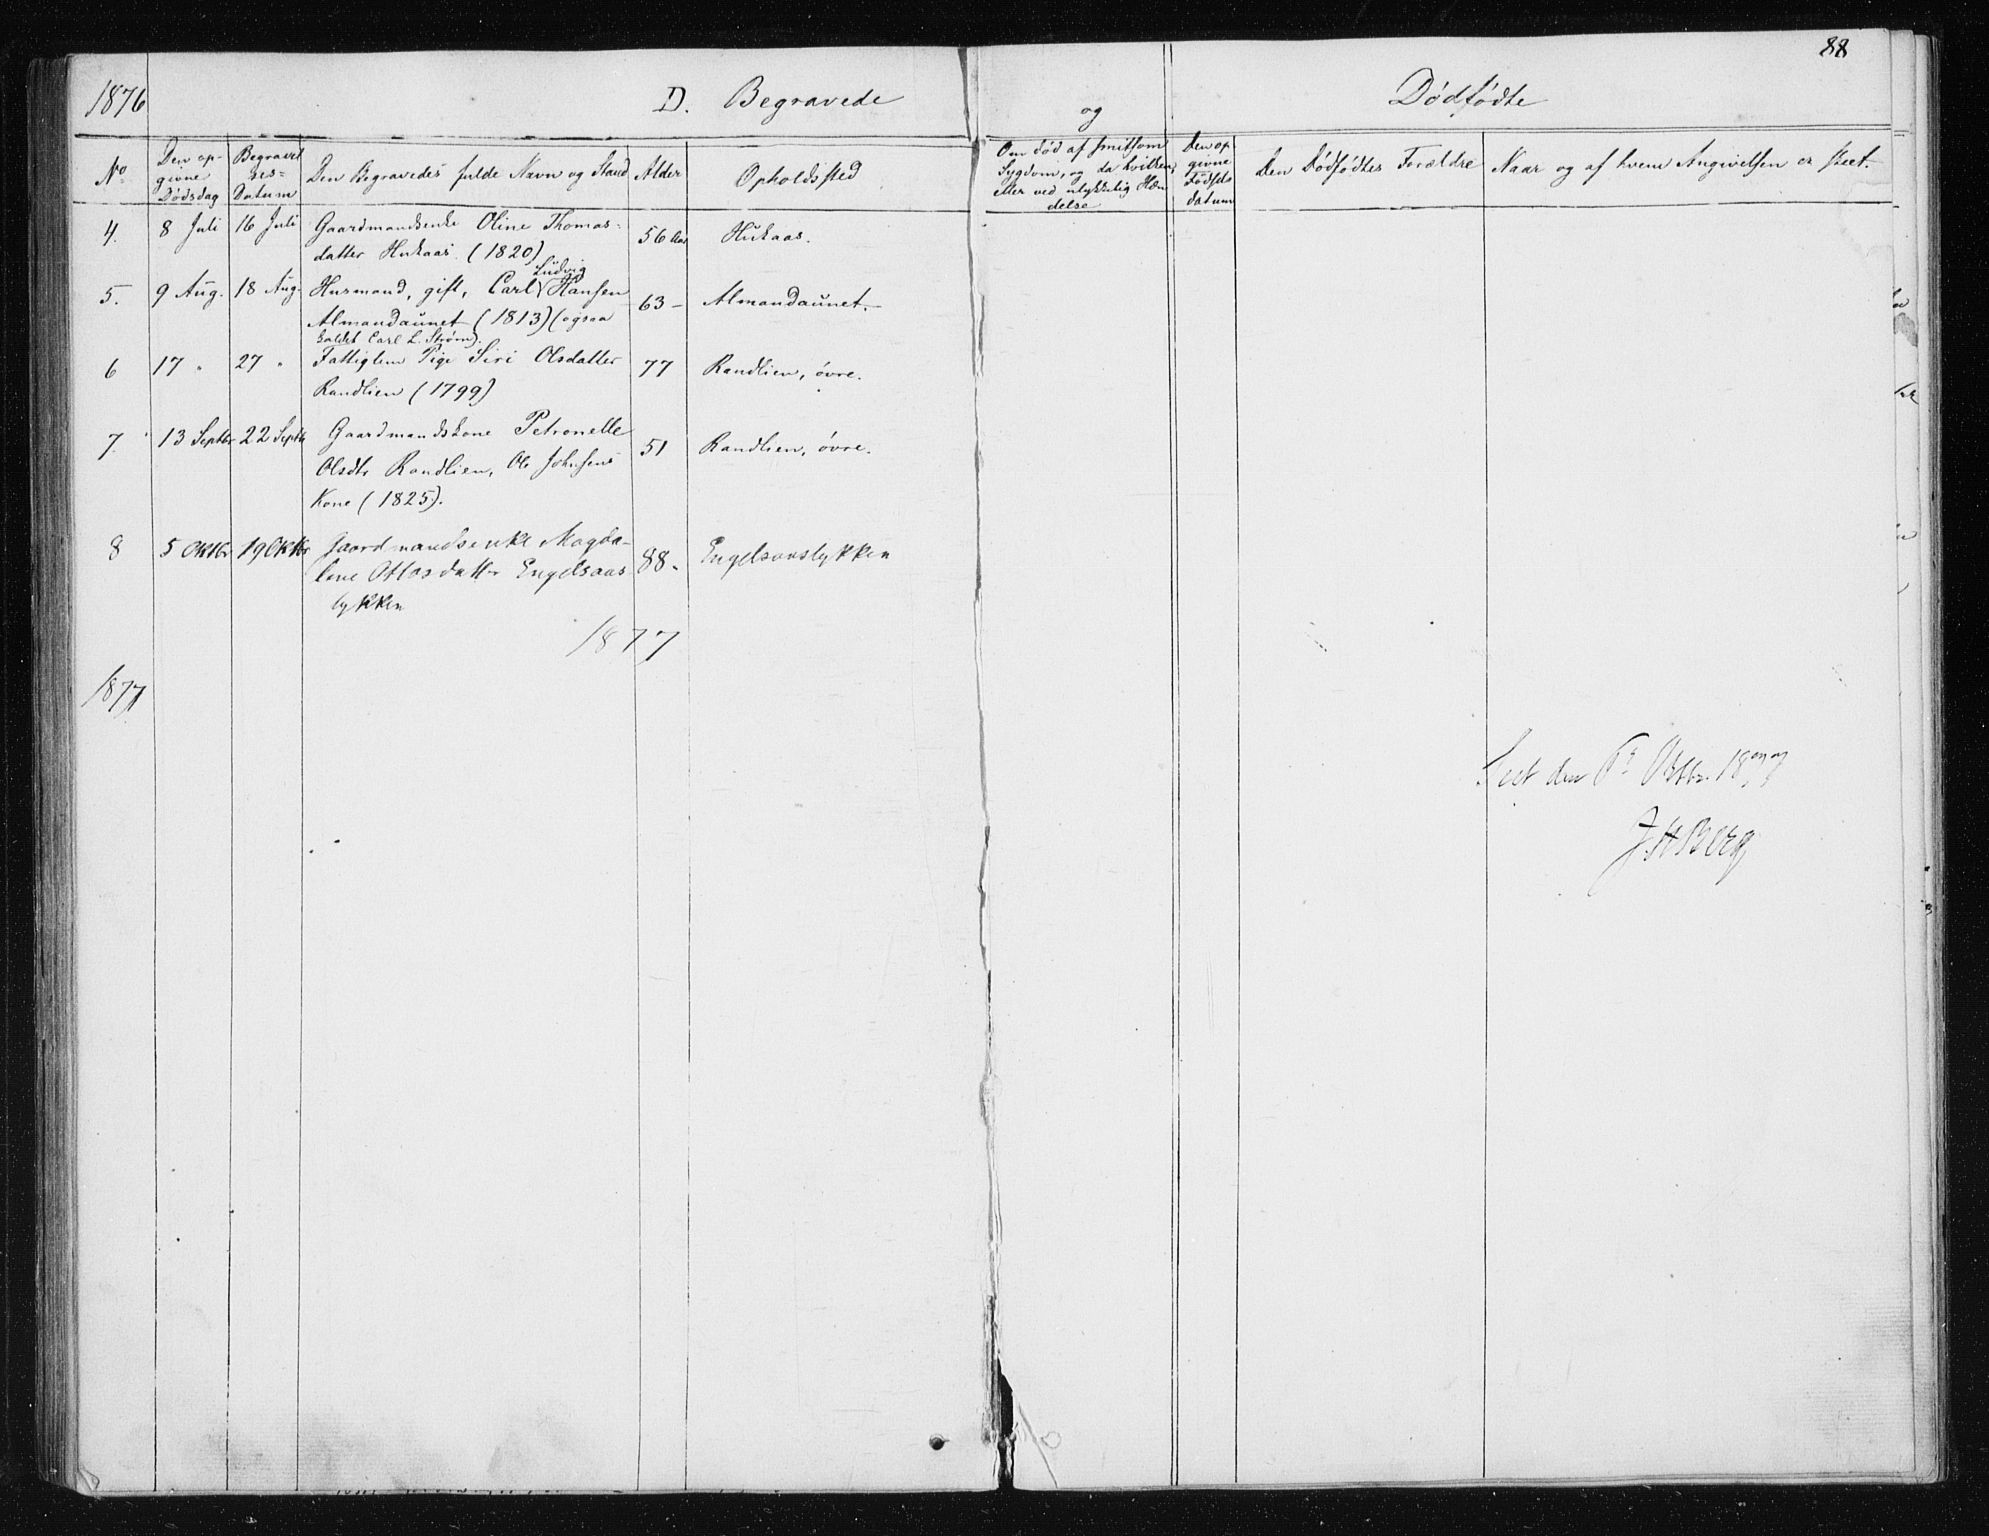 SAT, Ministerialprotokoller, klokkerbøker og fødselsregistre - Sør-Trøndelag, 608/L0333: Parish register (official) no. 608A02, 1862-1876, p. 88